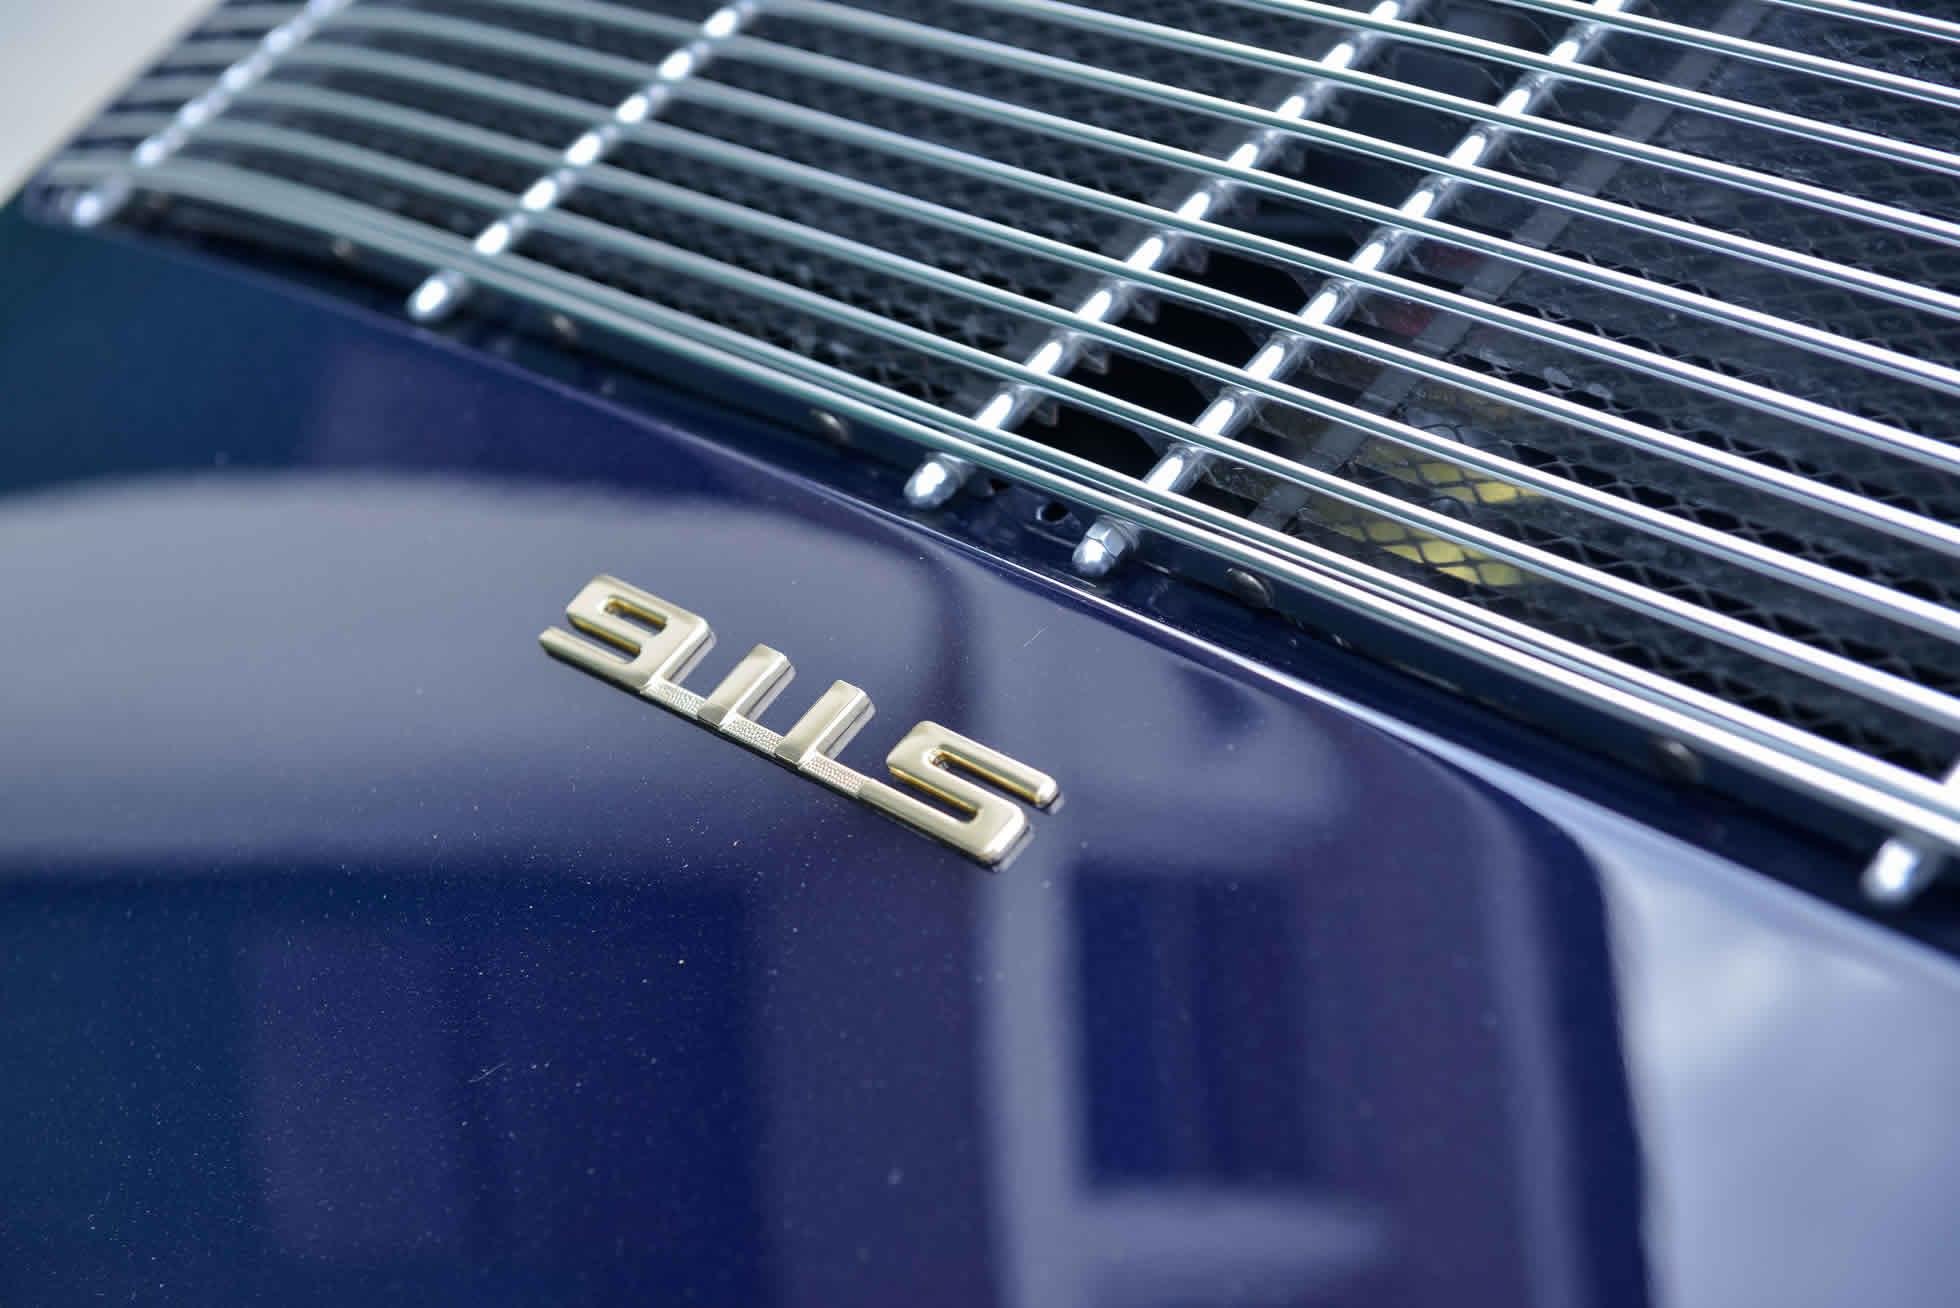 For Sale 1968 Porsche 911 S rear badging